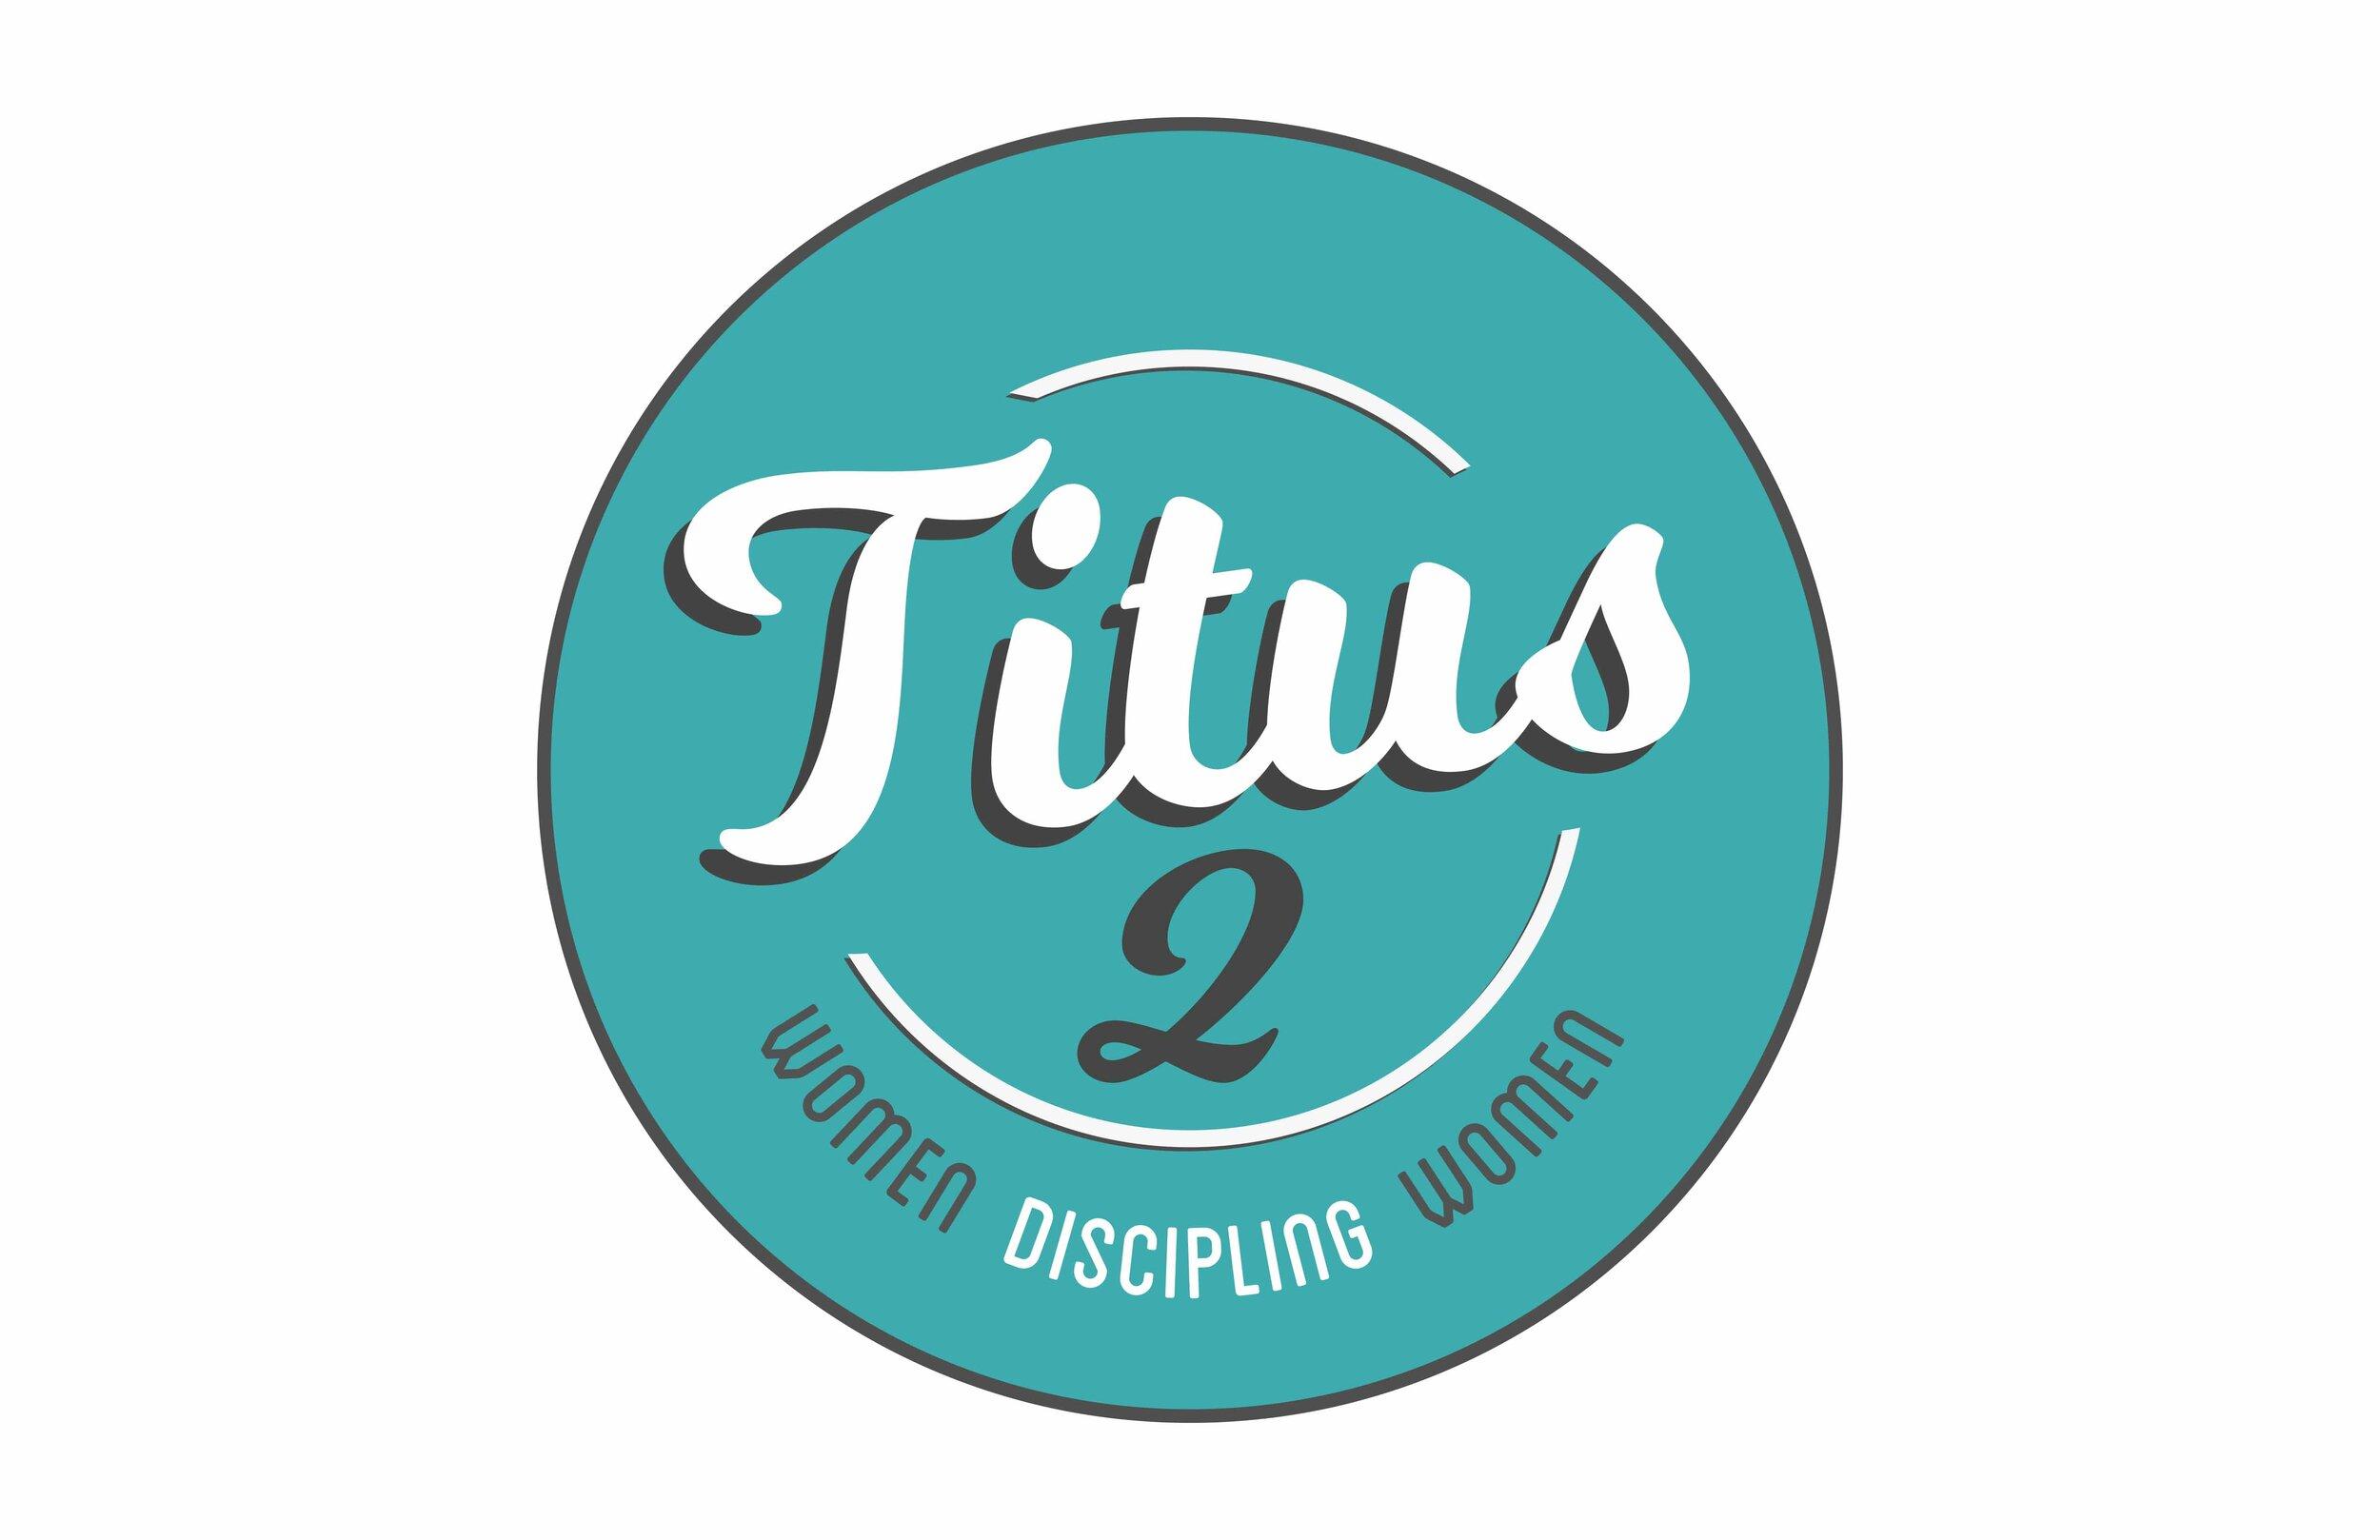 titus2.jpg